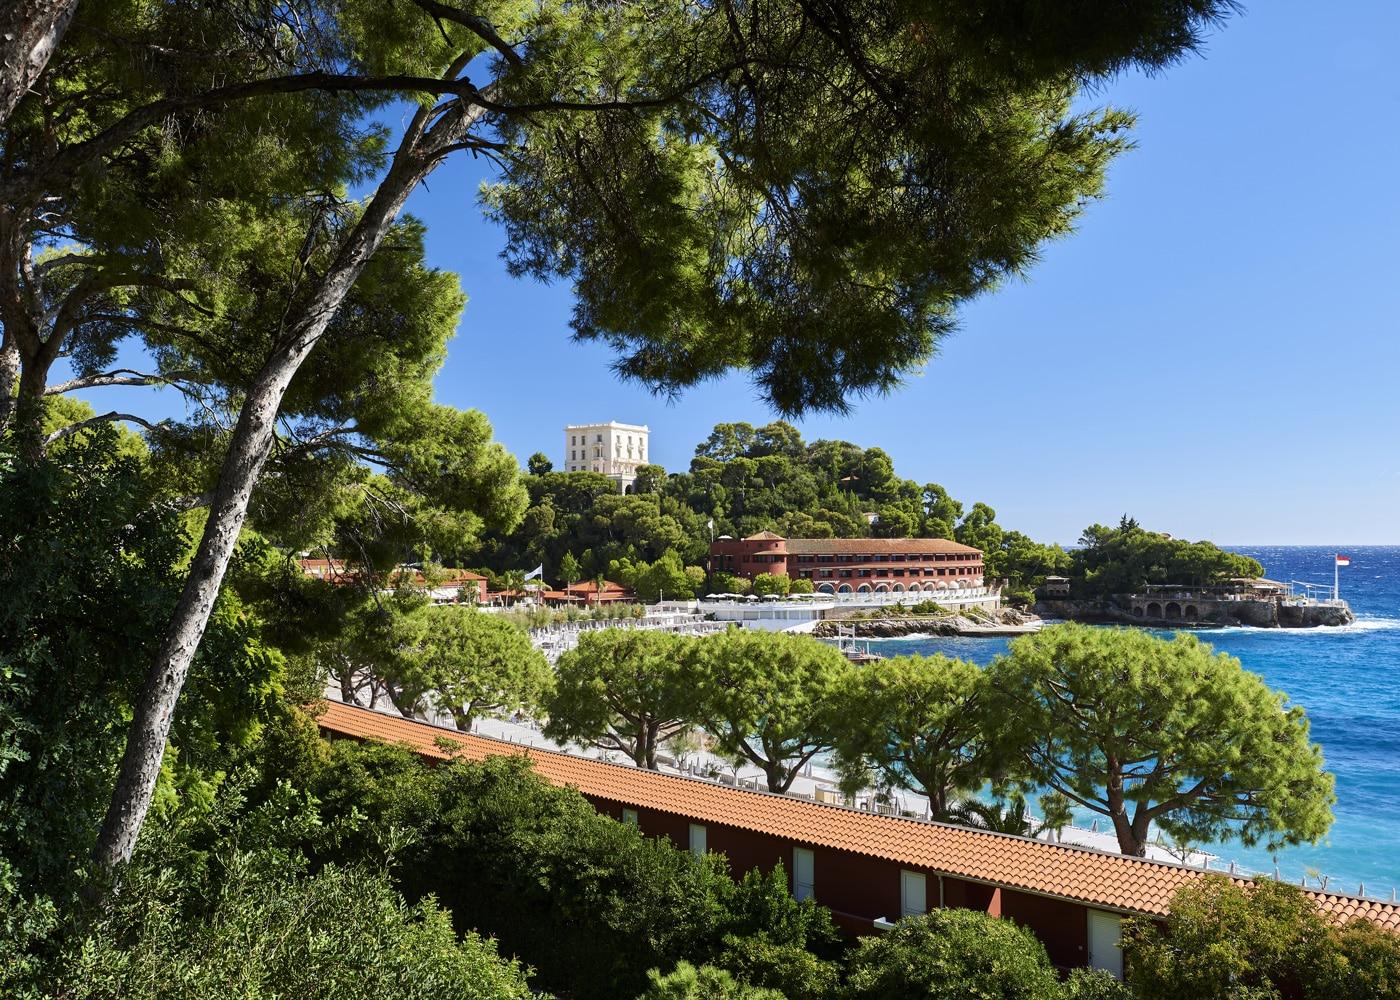 hotels-confinez-moi-ici-#4-mcmd-SBM-monte-carlo-beach-vue-exterieure